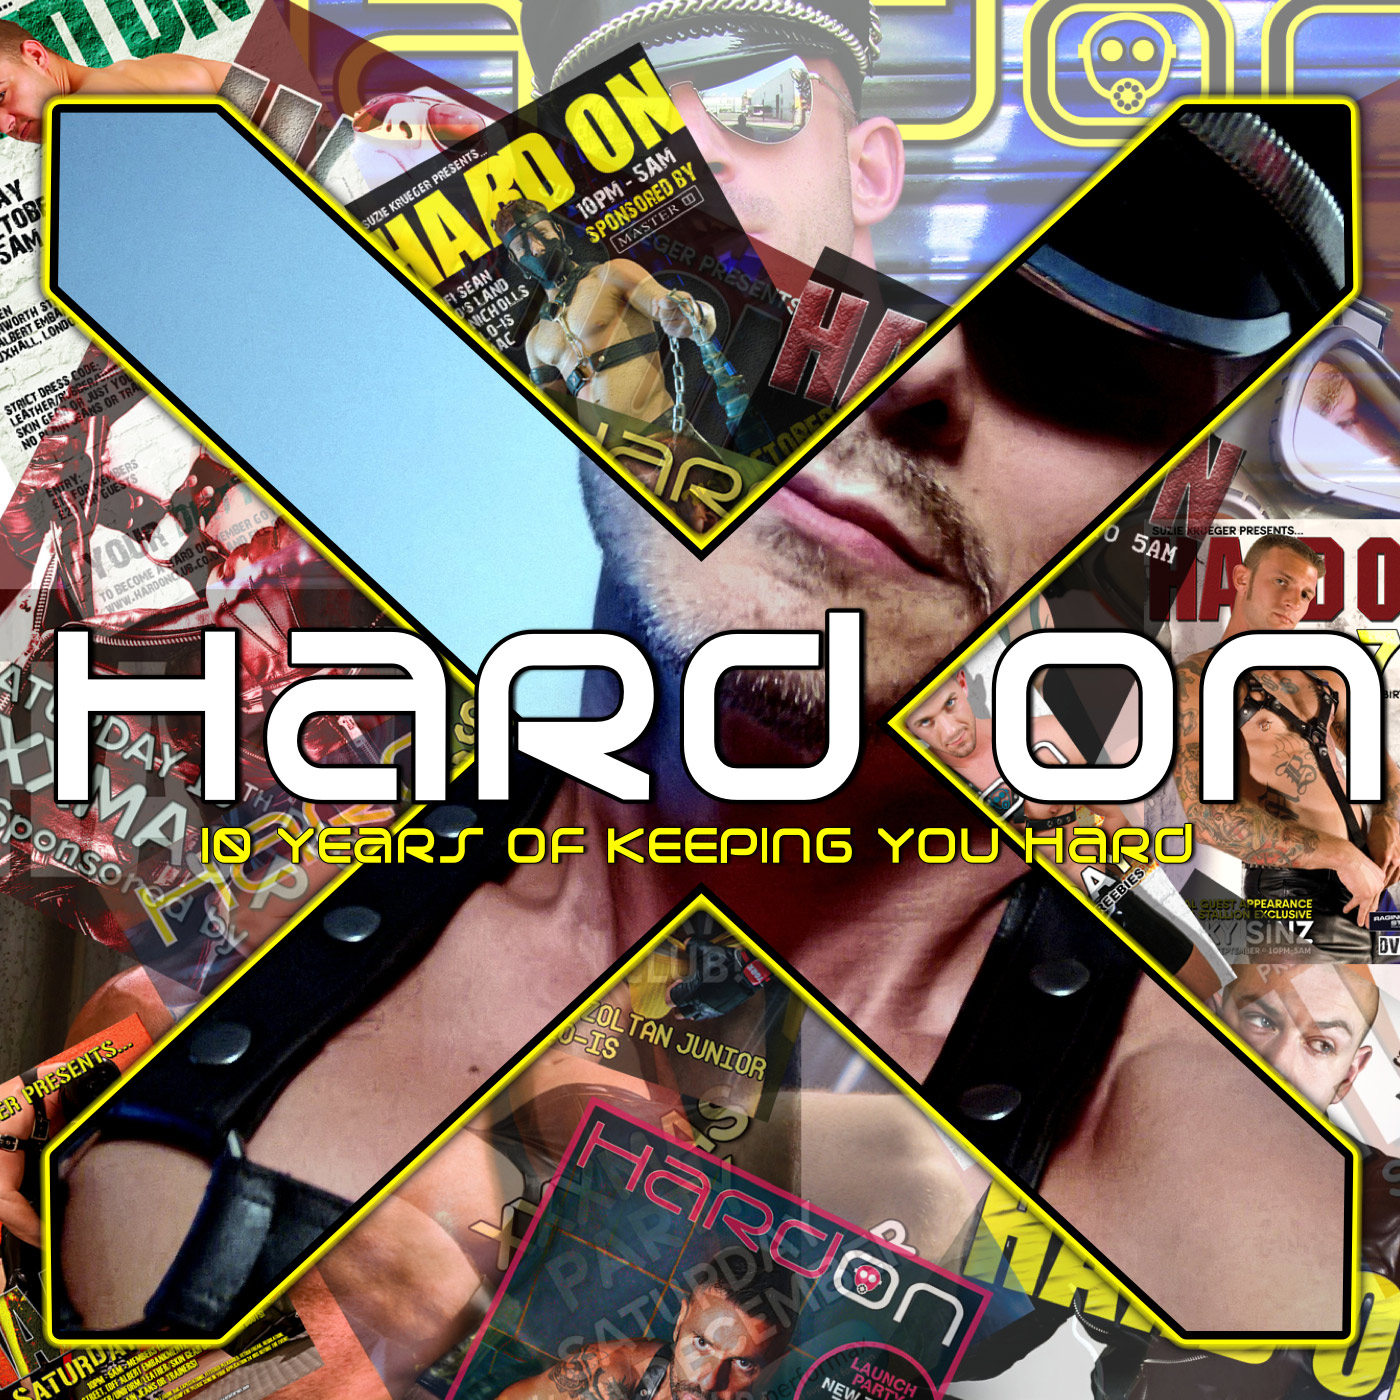 PODCAST: HARD ON X